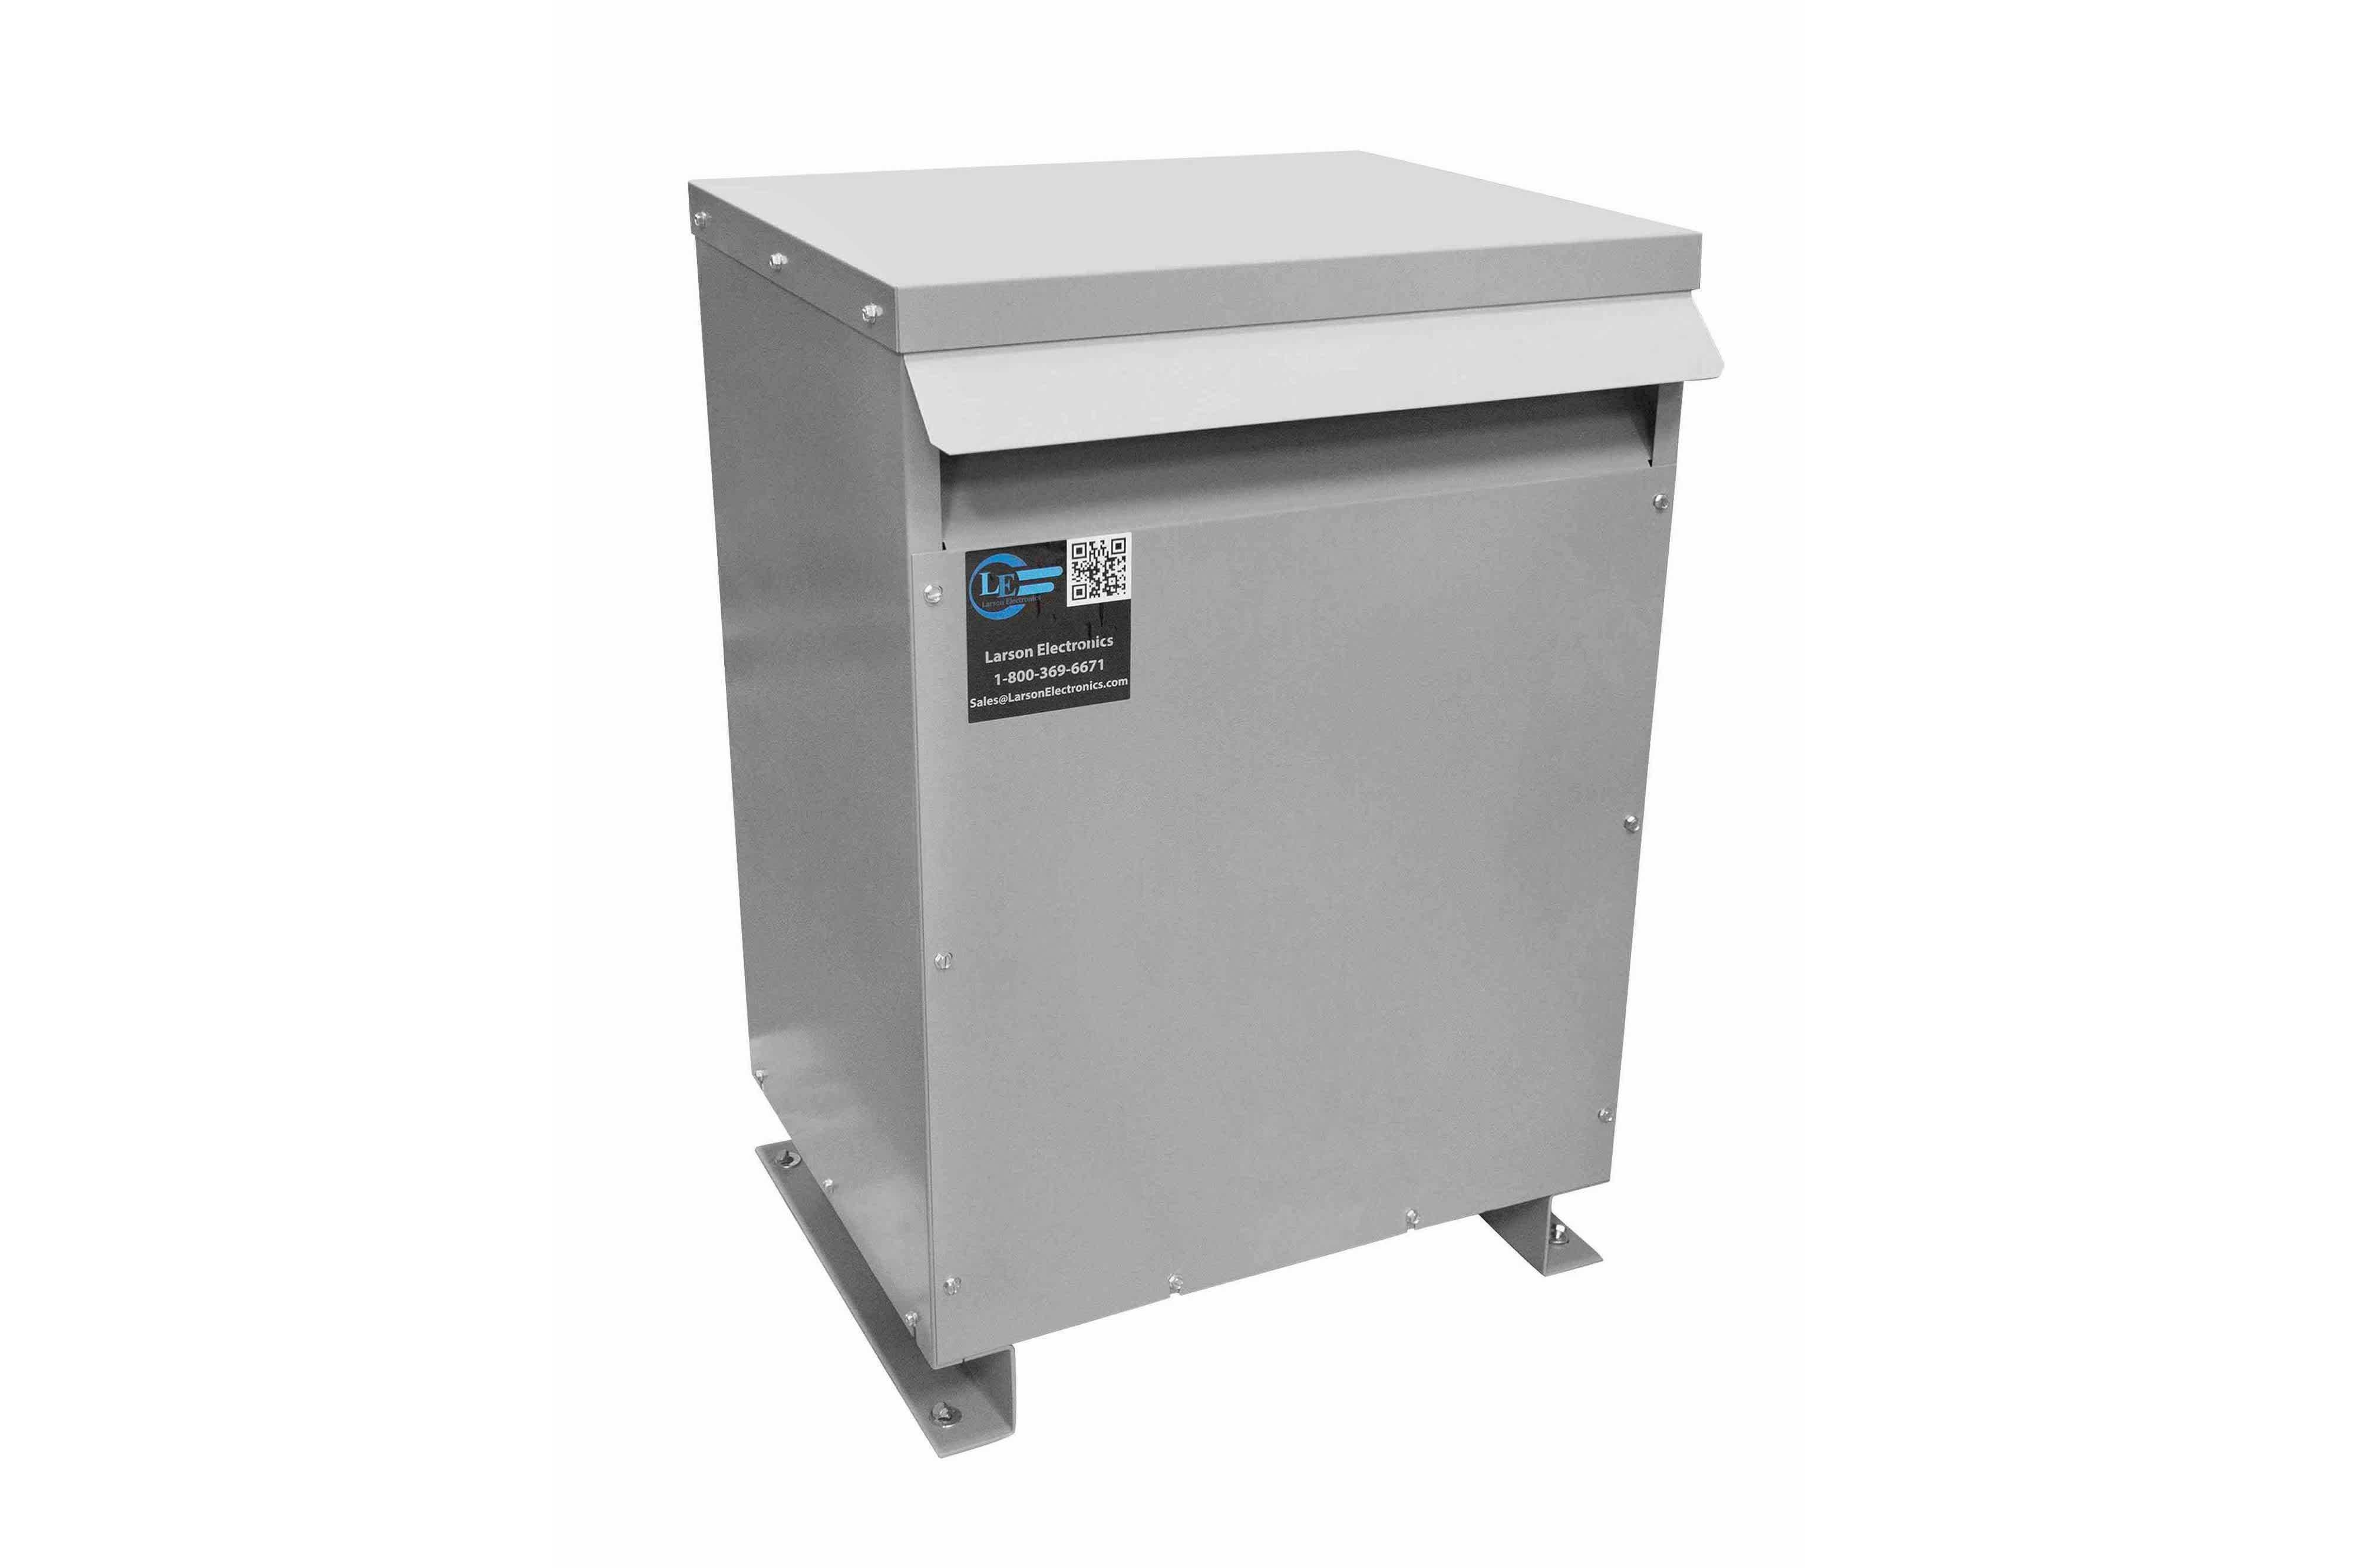 27 kVA 3PH Isolation Transformer, 415V Wye Primary, 240V Delta Secondary, N3R, Ventilated, 60 Hz